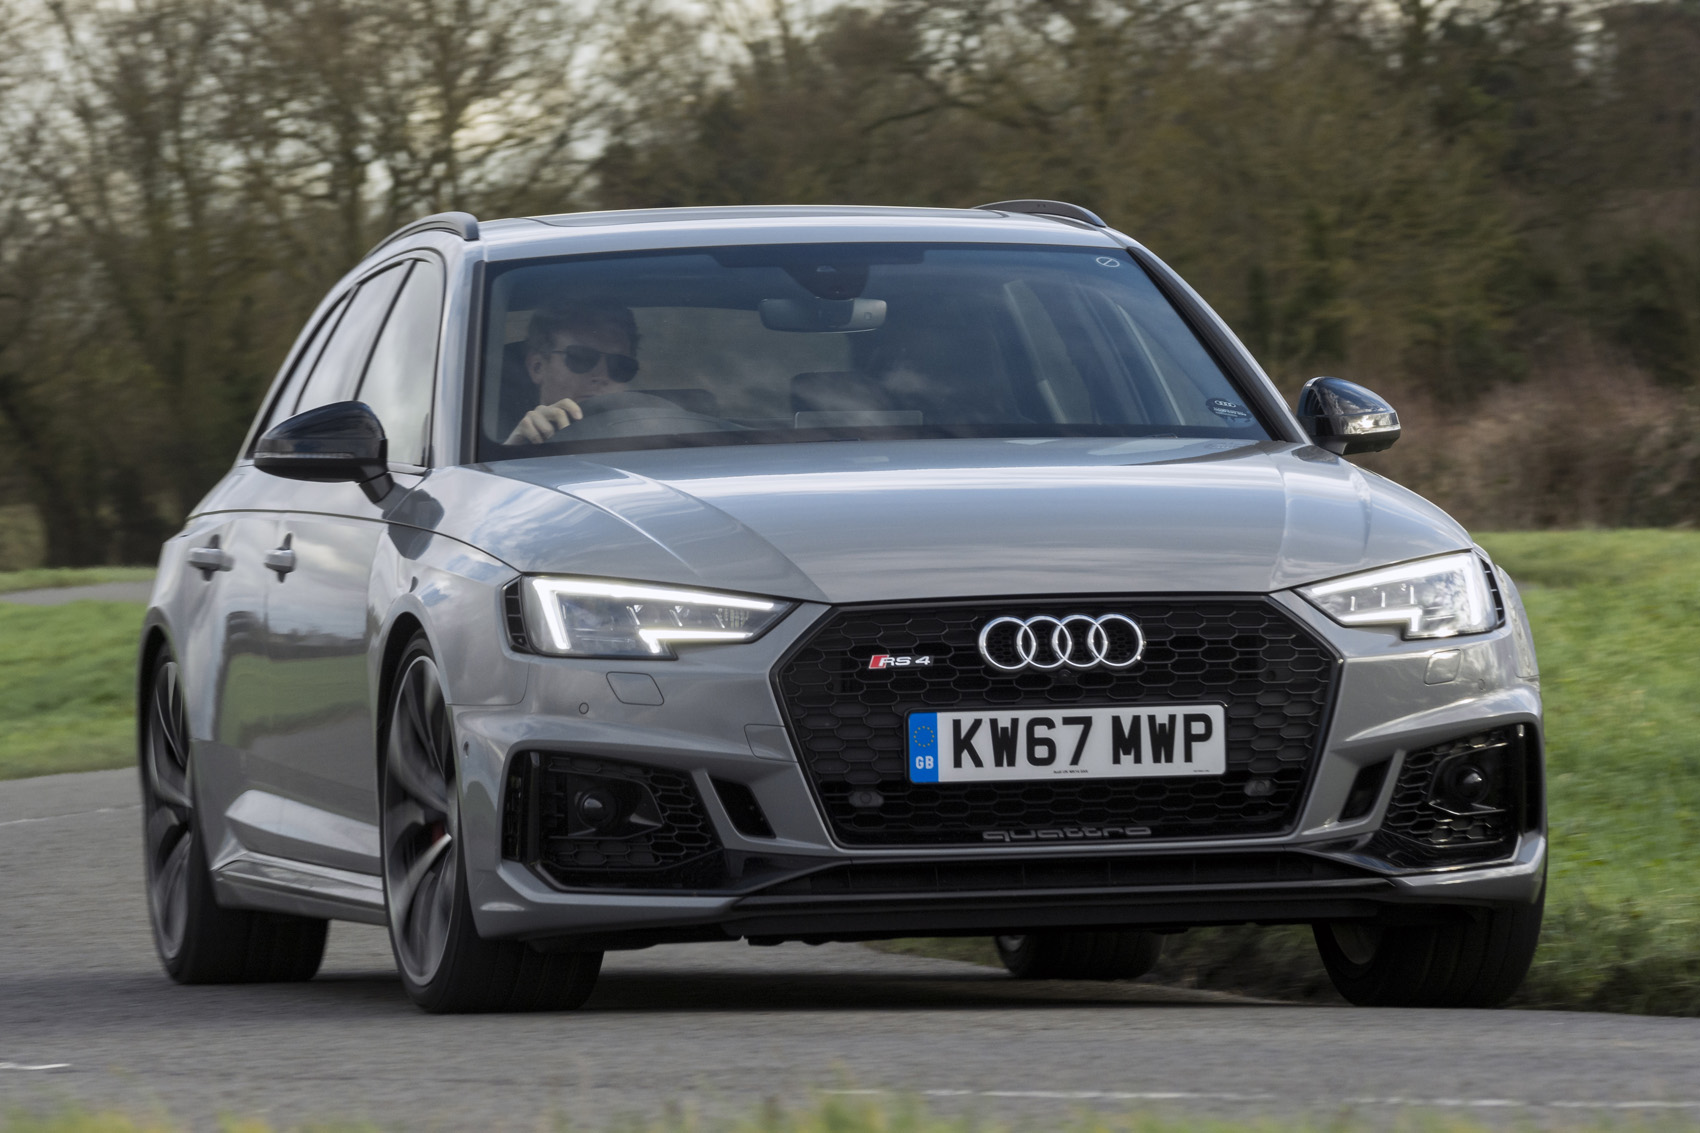 Kelebihan Audi A4 Rs Review